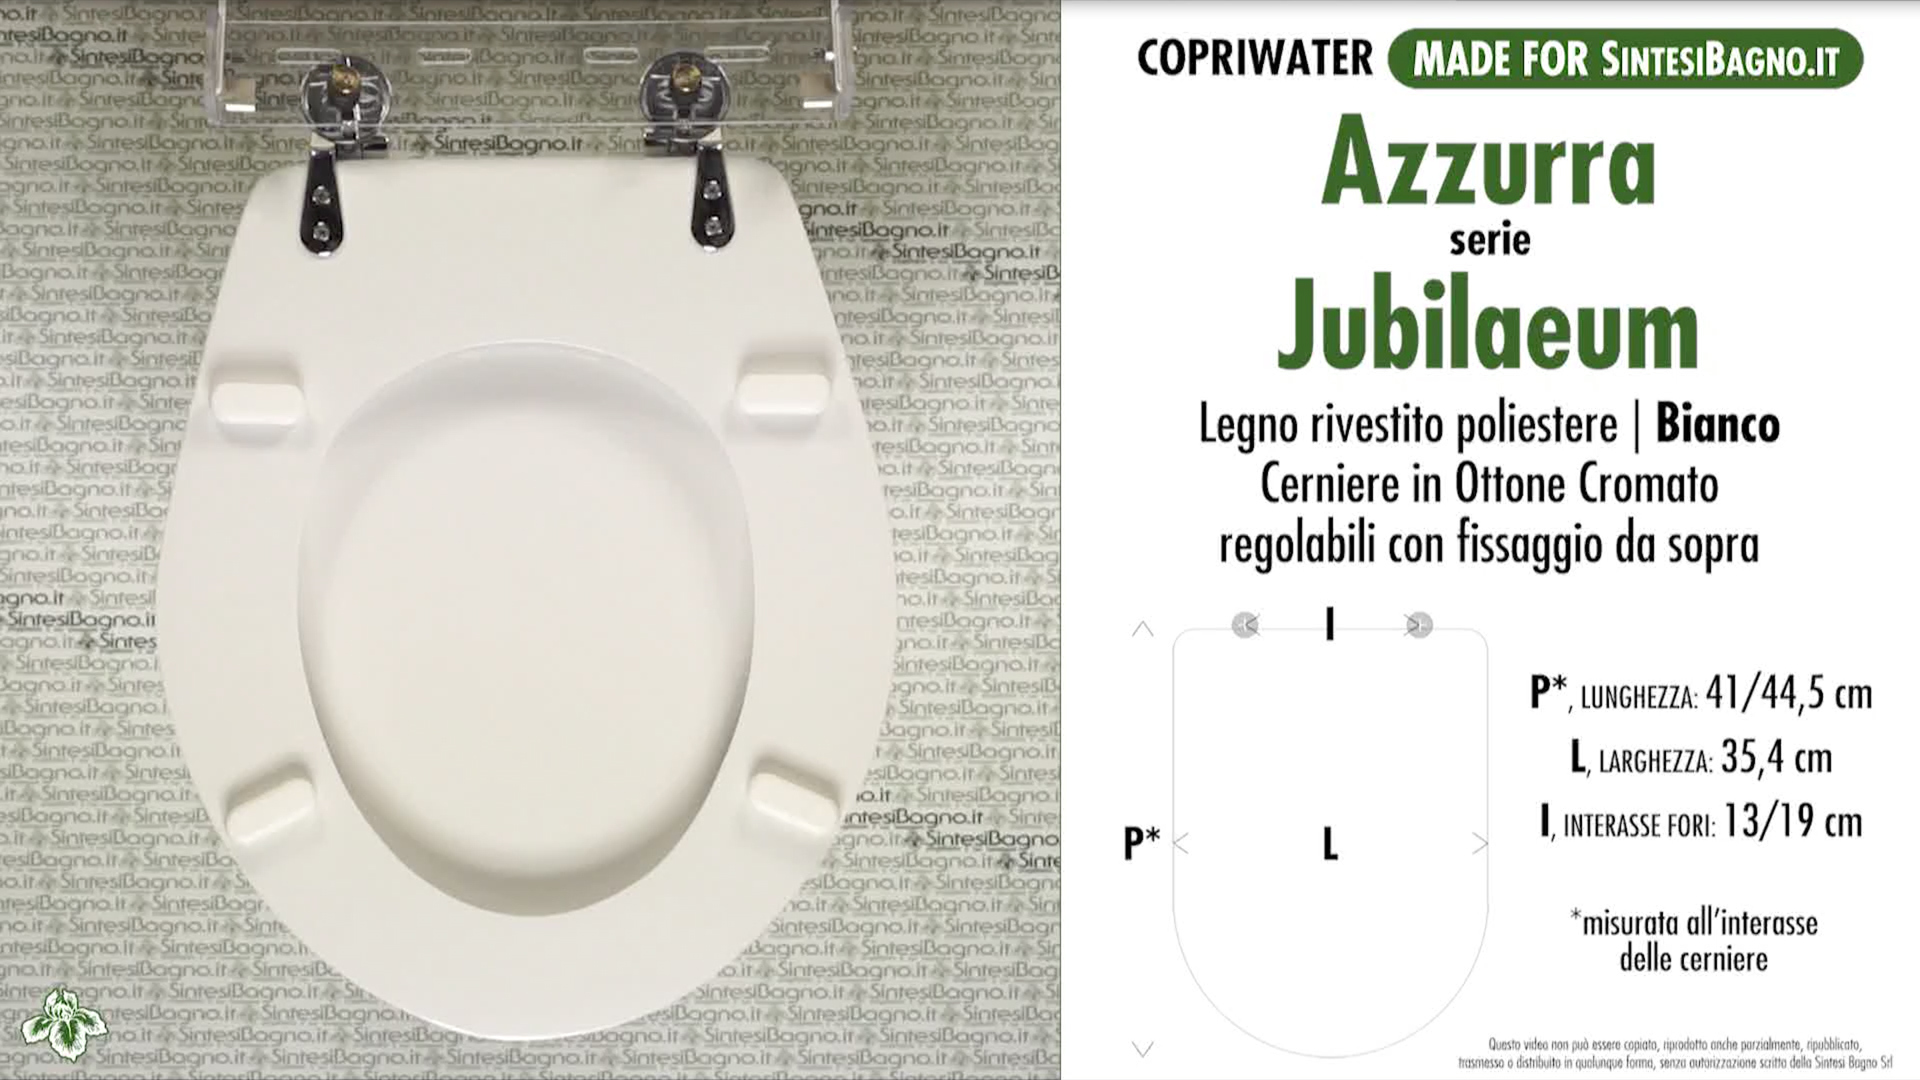 SCHEDA TECNICA MISURE copriwater AZZURRA JUBILAEUM